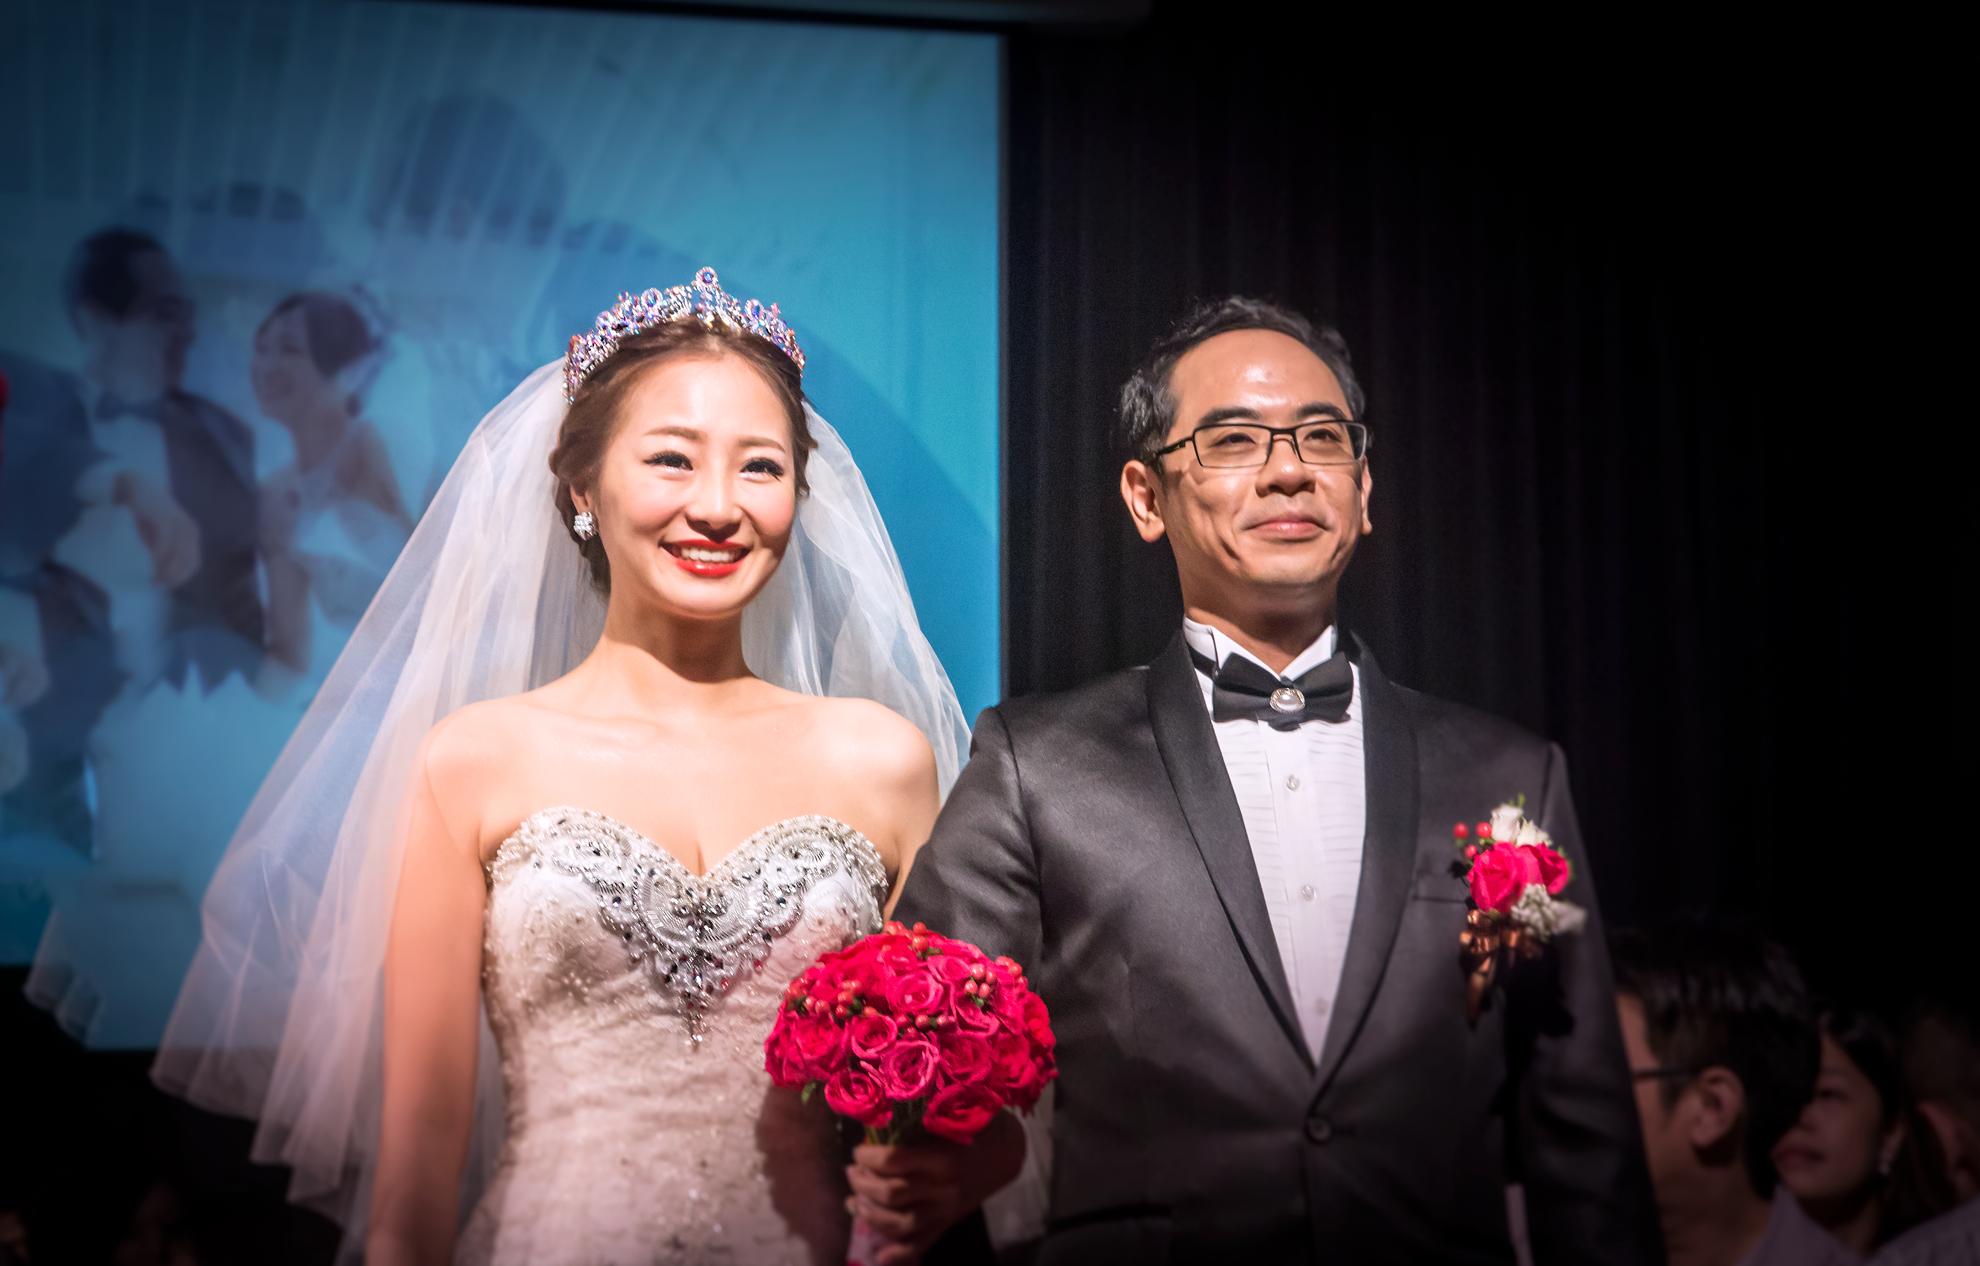 CUBY-台北花園大酒店-結婚晚宴-進場-婚攝CUBY